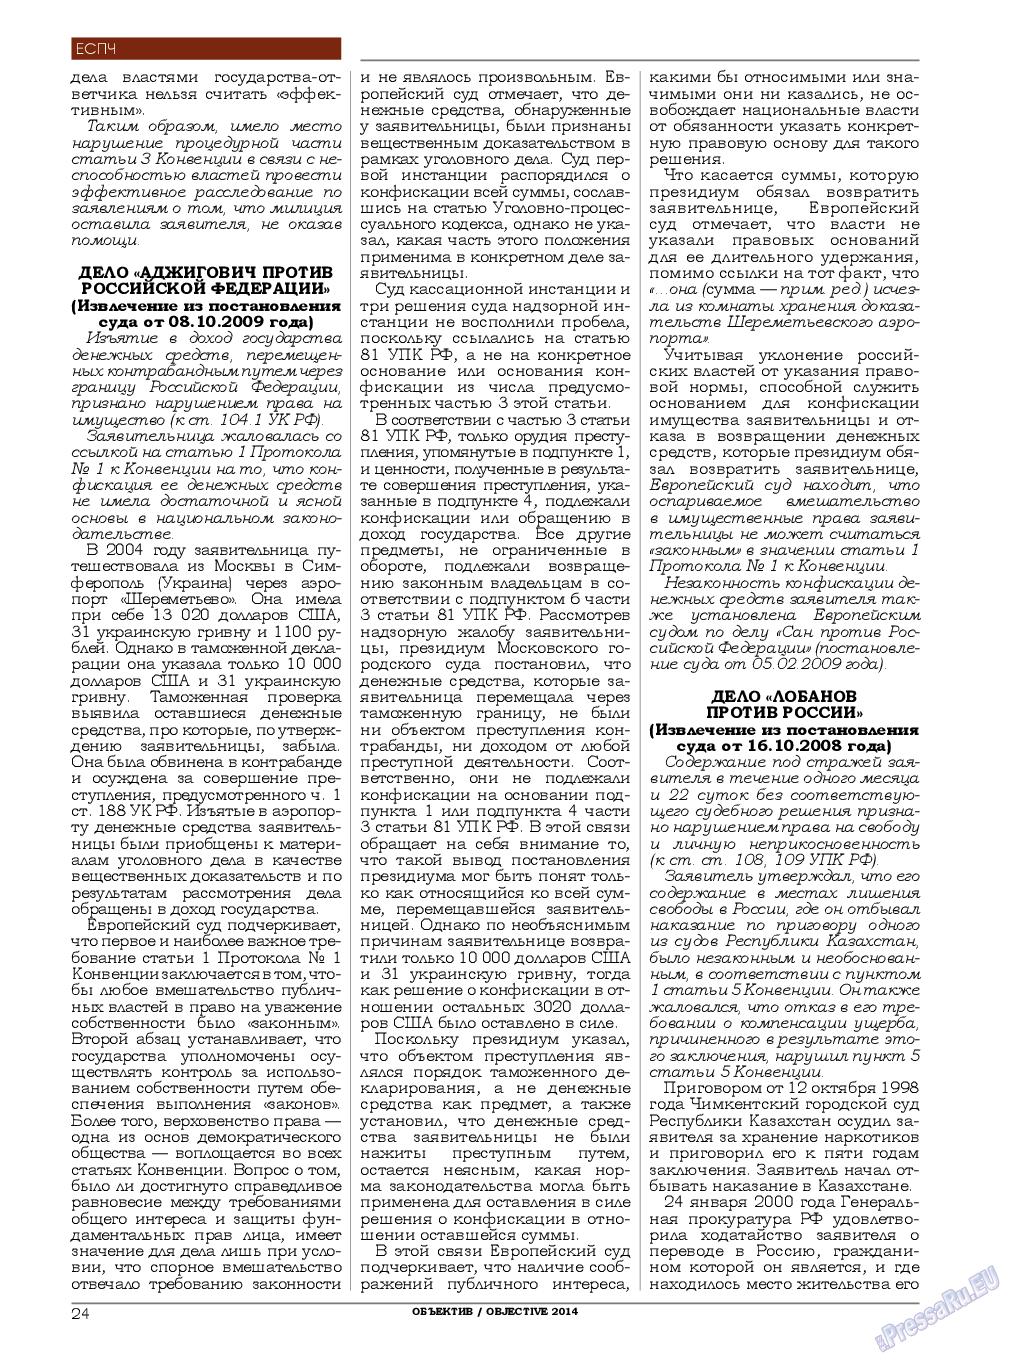 Объектив EU (журнал). 2014 год, номер 3, стр. 24